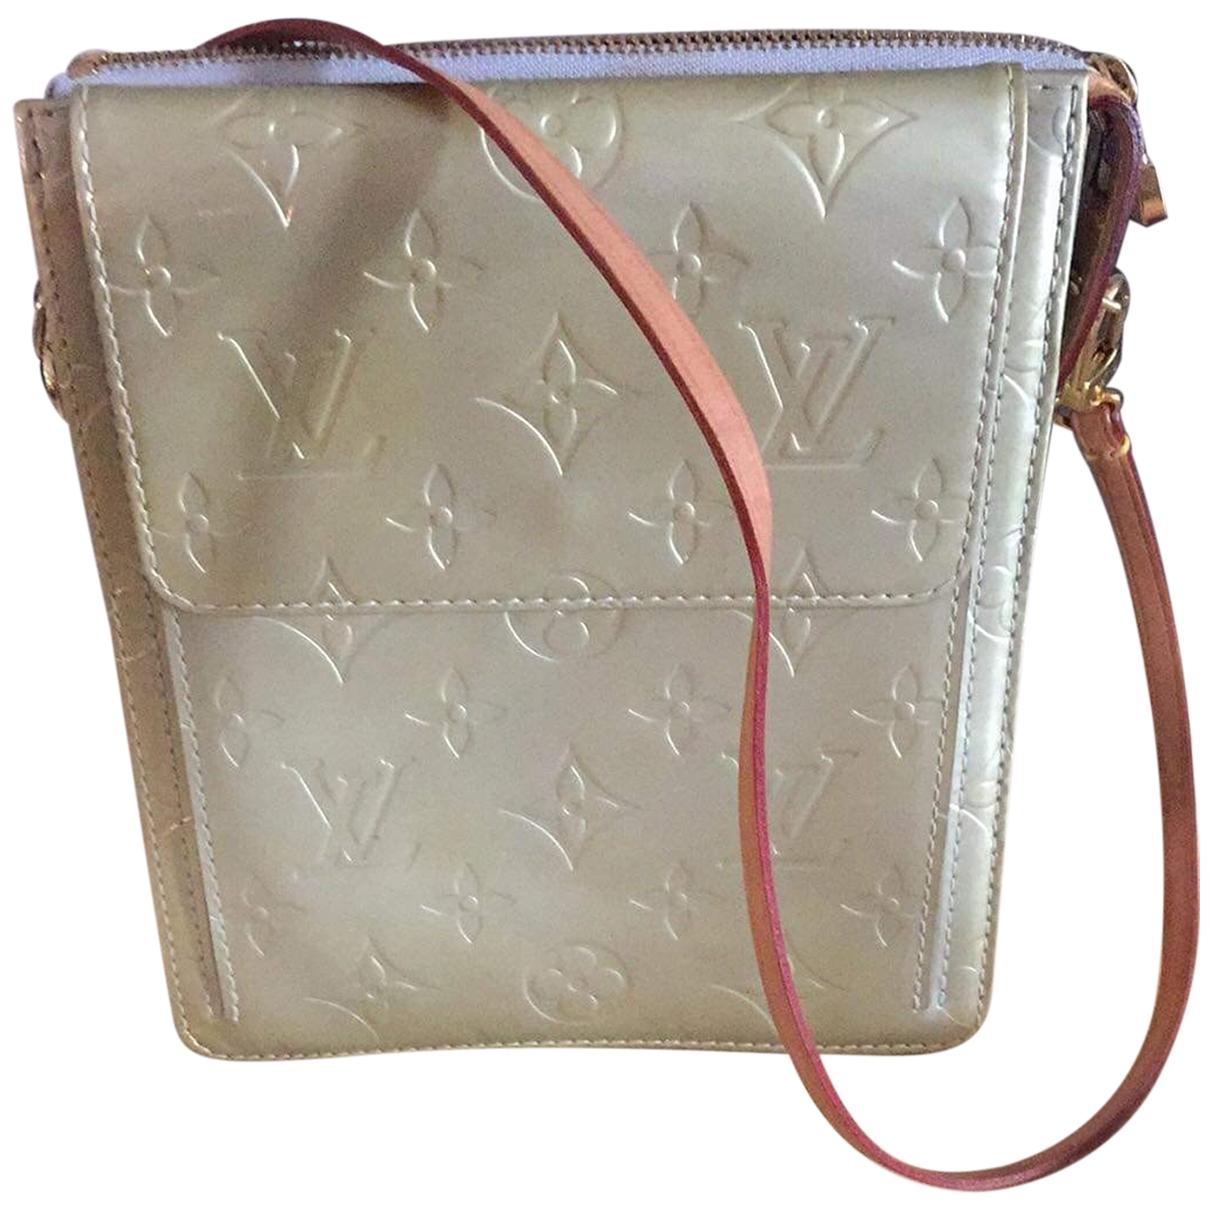 Louis Vuitton \N Silver Patent leather handbag for Women \N